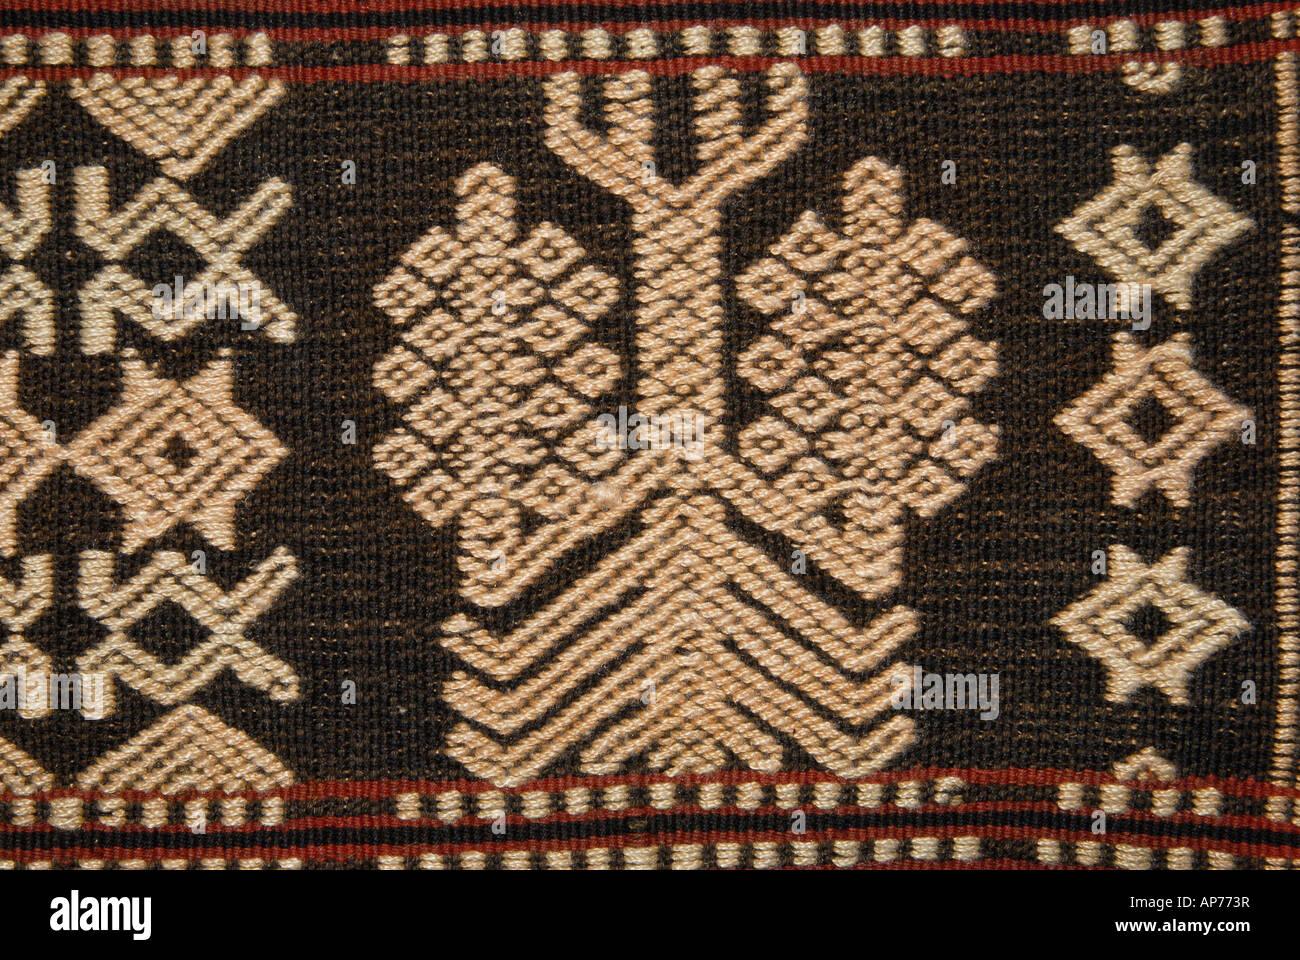 Detail of supplementary warp brocading on a Sumbanese fabric Sumba Indonesia - Stock Image